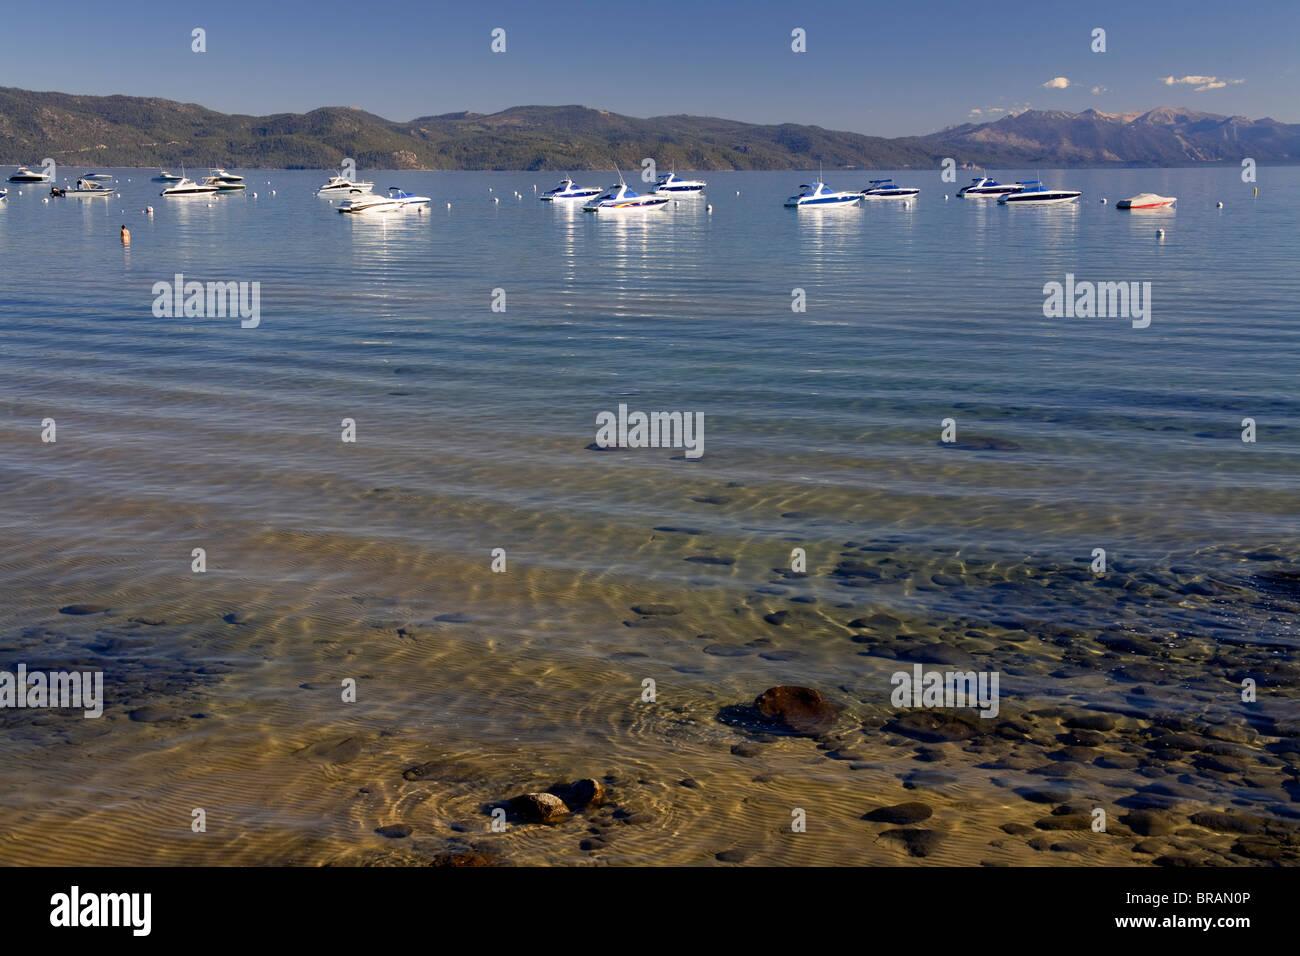 Tahoe Vista Recreation Area, Lake Tahoe, California, United States of America, North America Stock Photo